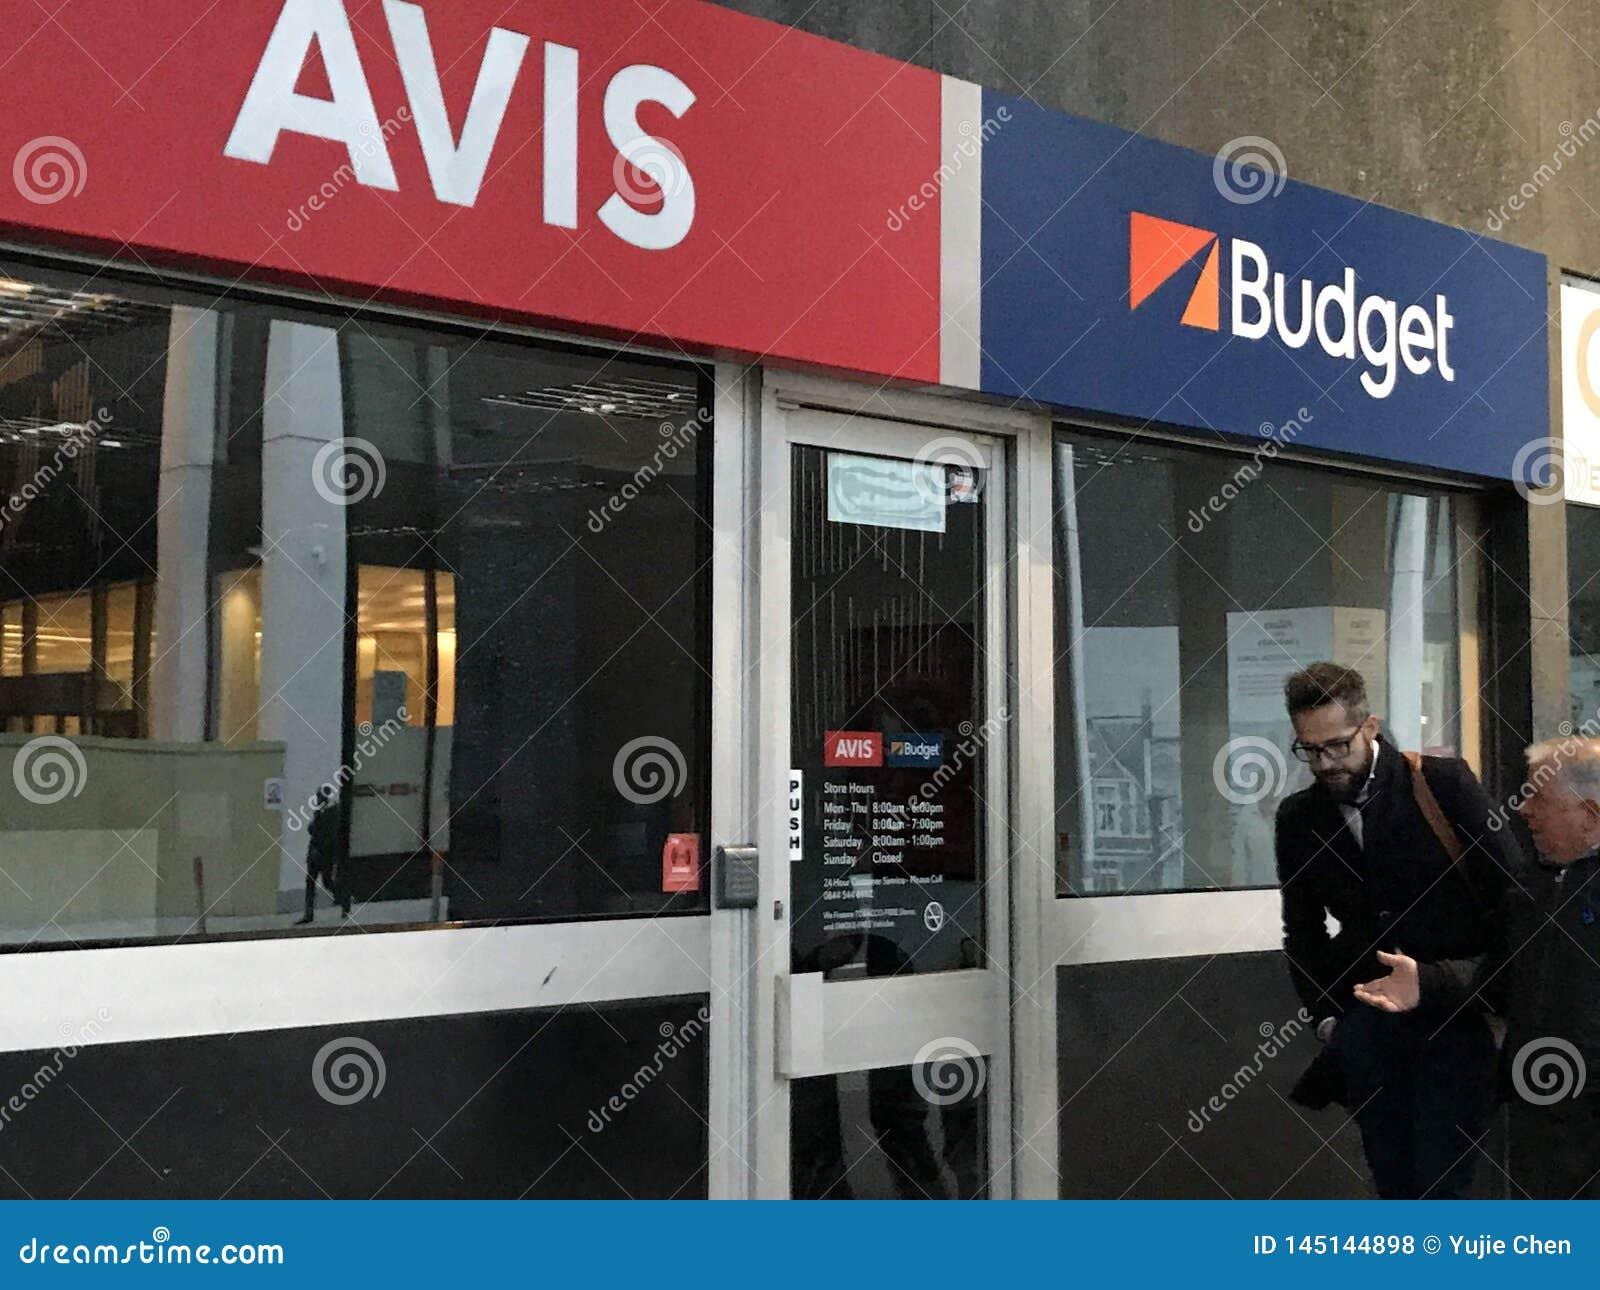 Avis Budget store, London